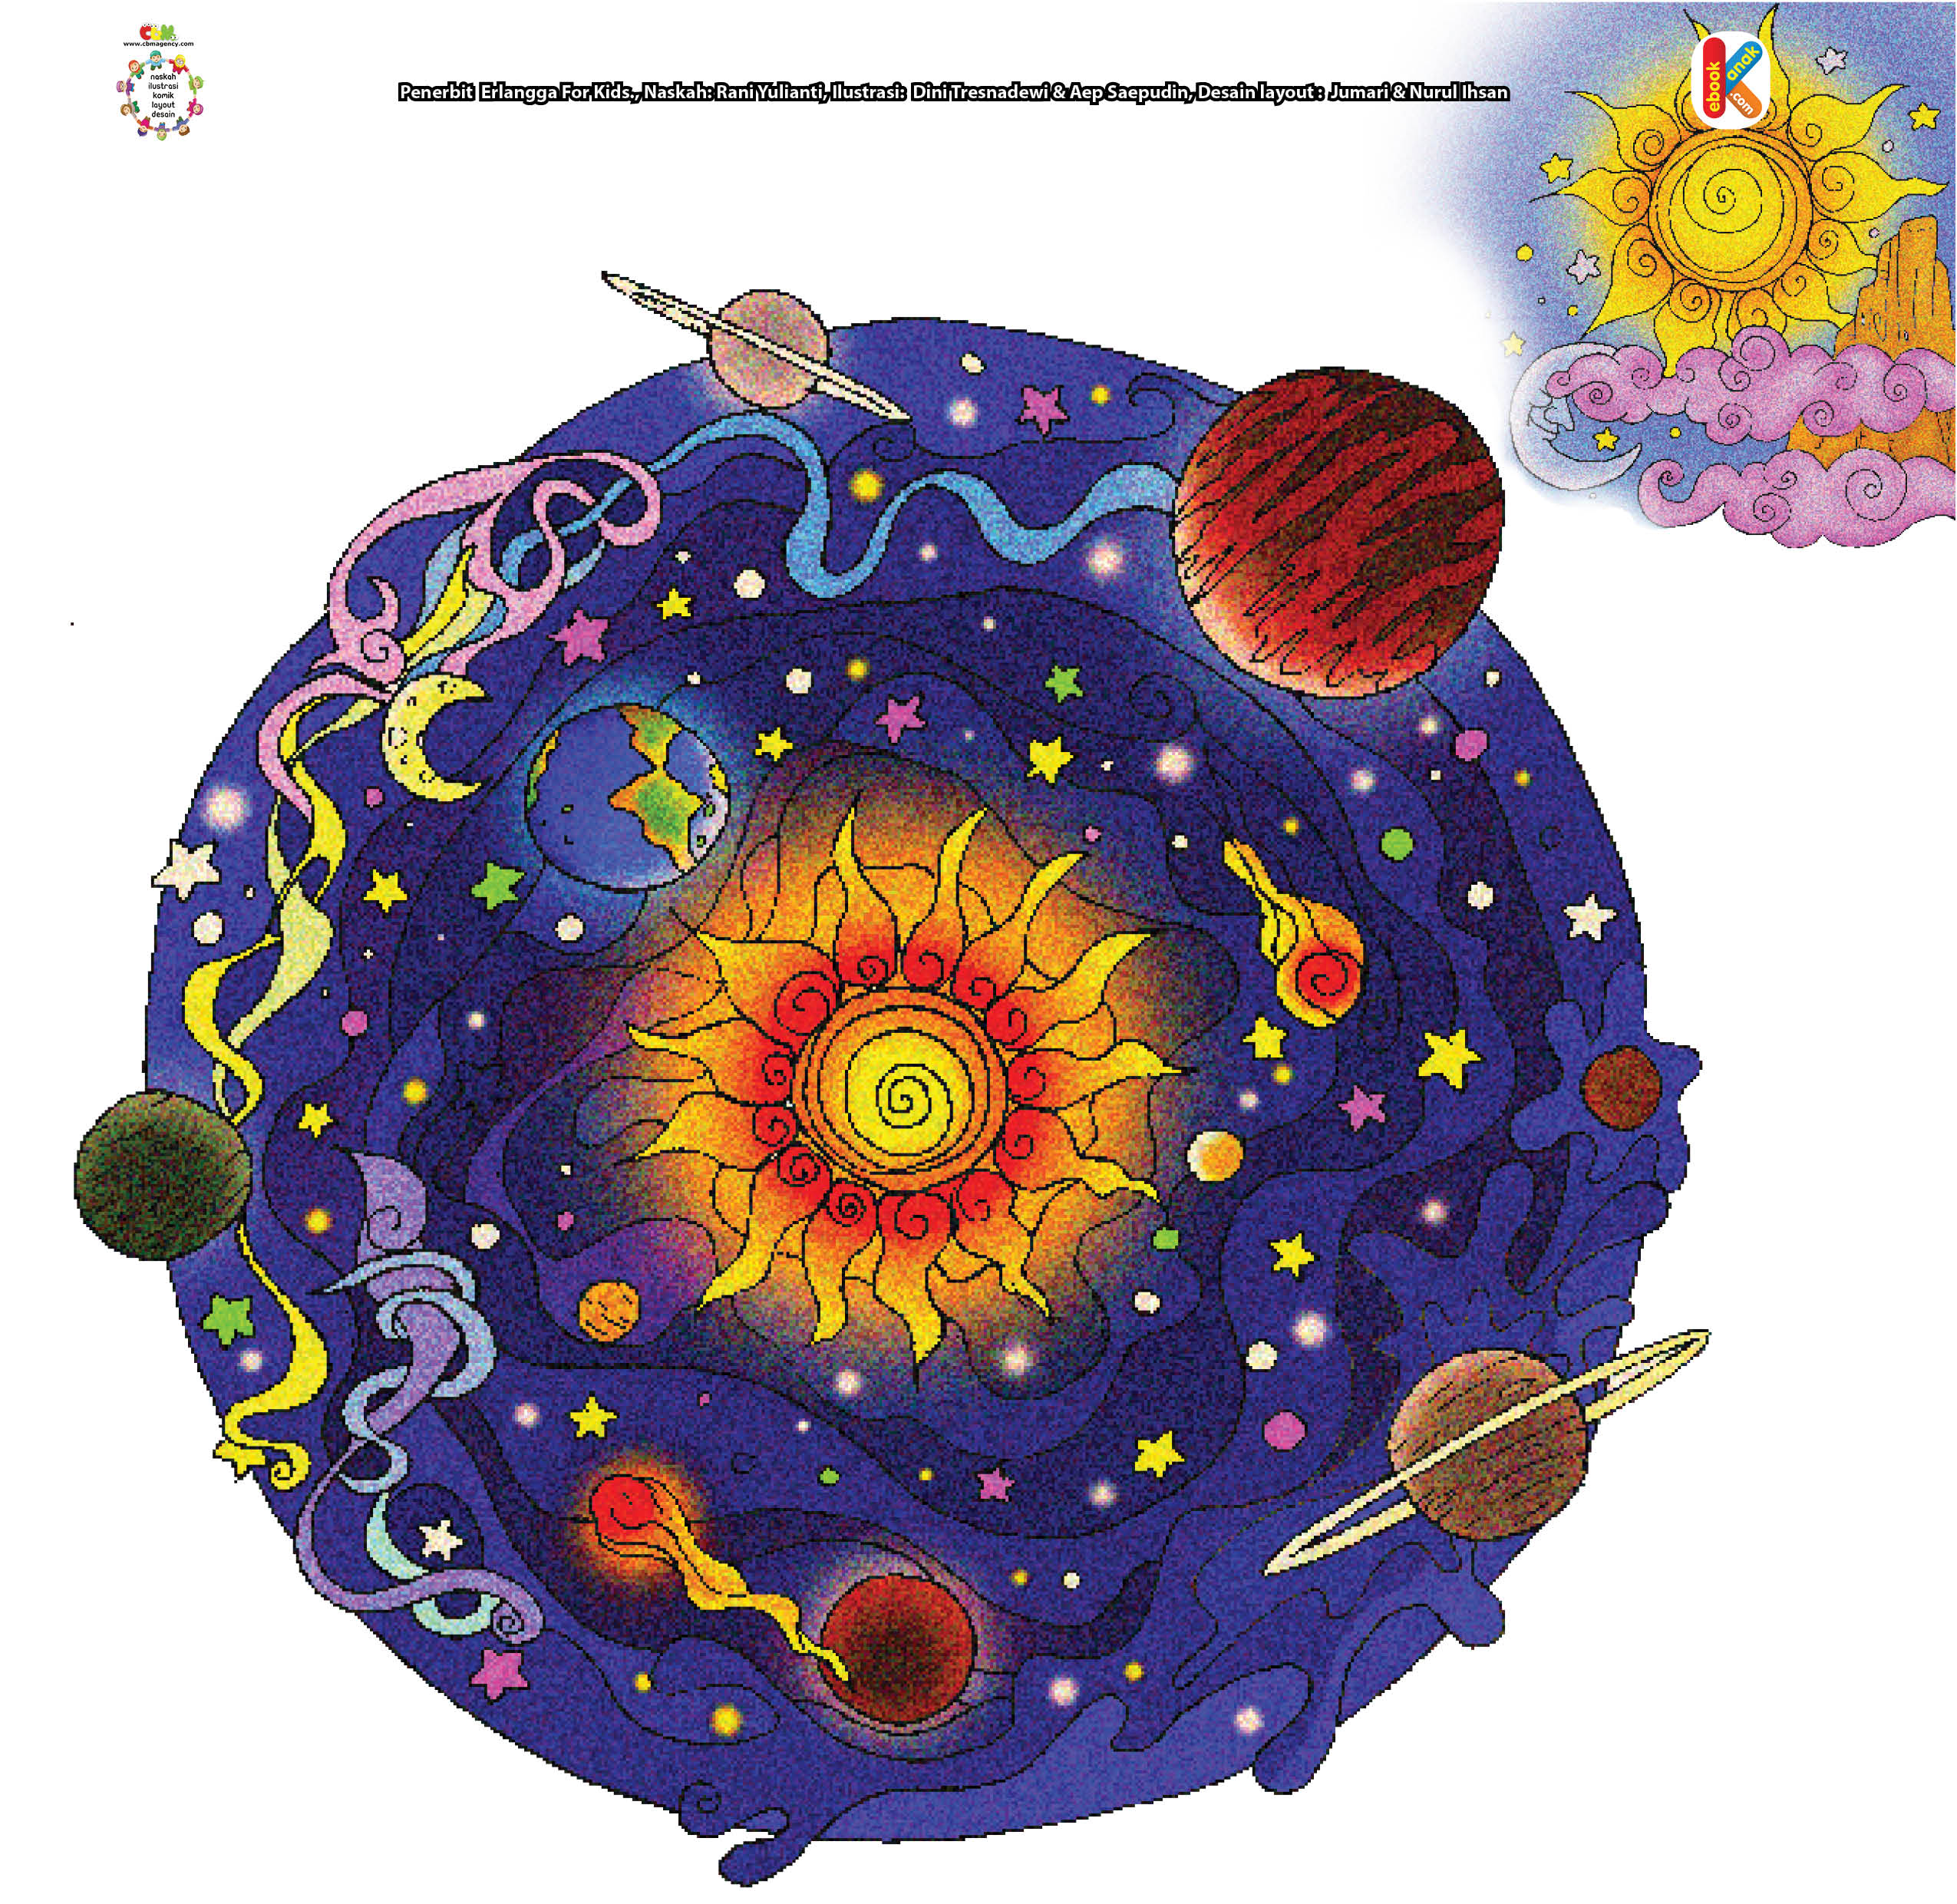 Kejadian bumi mengelilingi matahari pada porosnya tersebut juga mendatangkan berbagai macam musim di bumi, menandai hari, dan pergantian tahun.